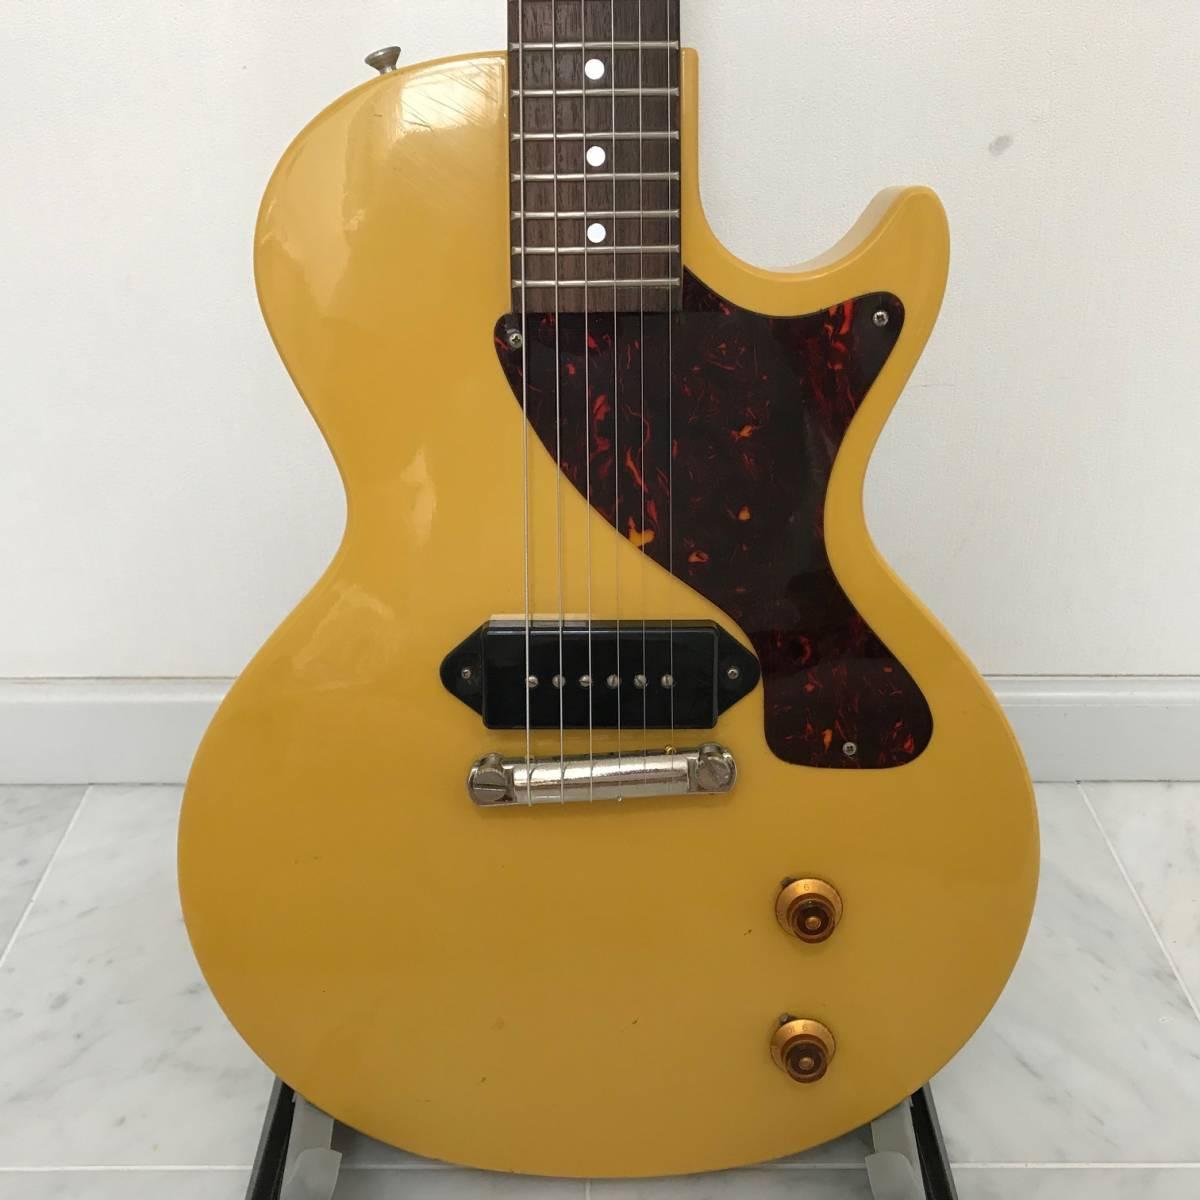 Orville by Gibson Les Paul Junior オービル バイ ギブソン レスポールジュニア イエロー 重量3.6kg_画像3